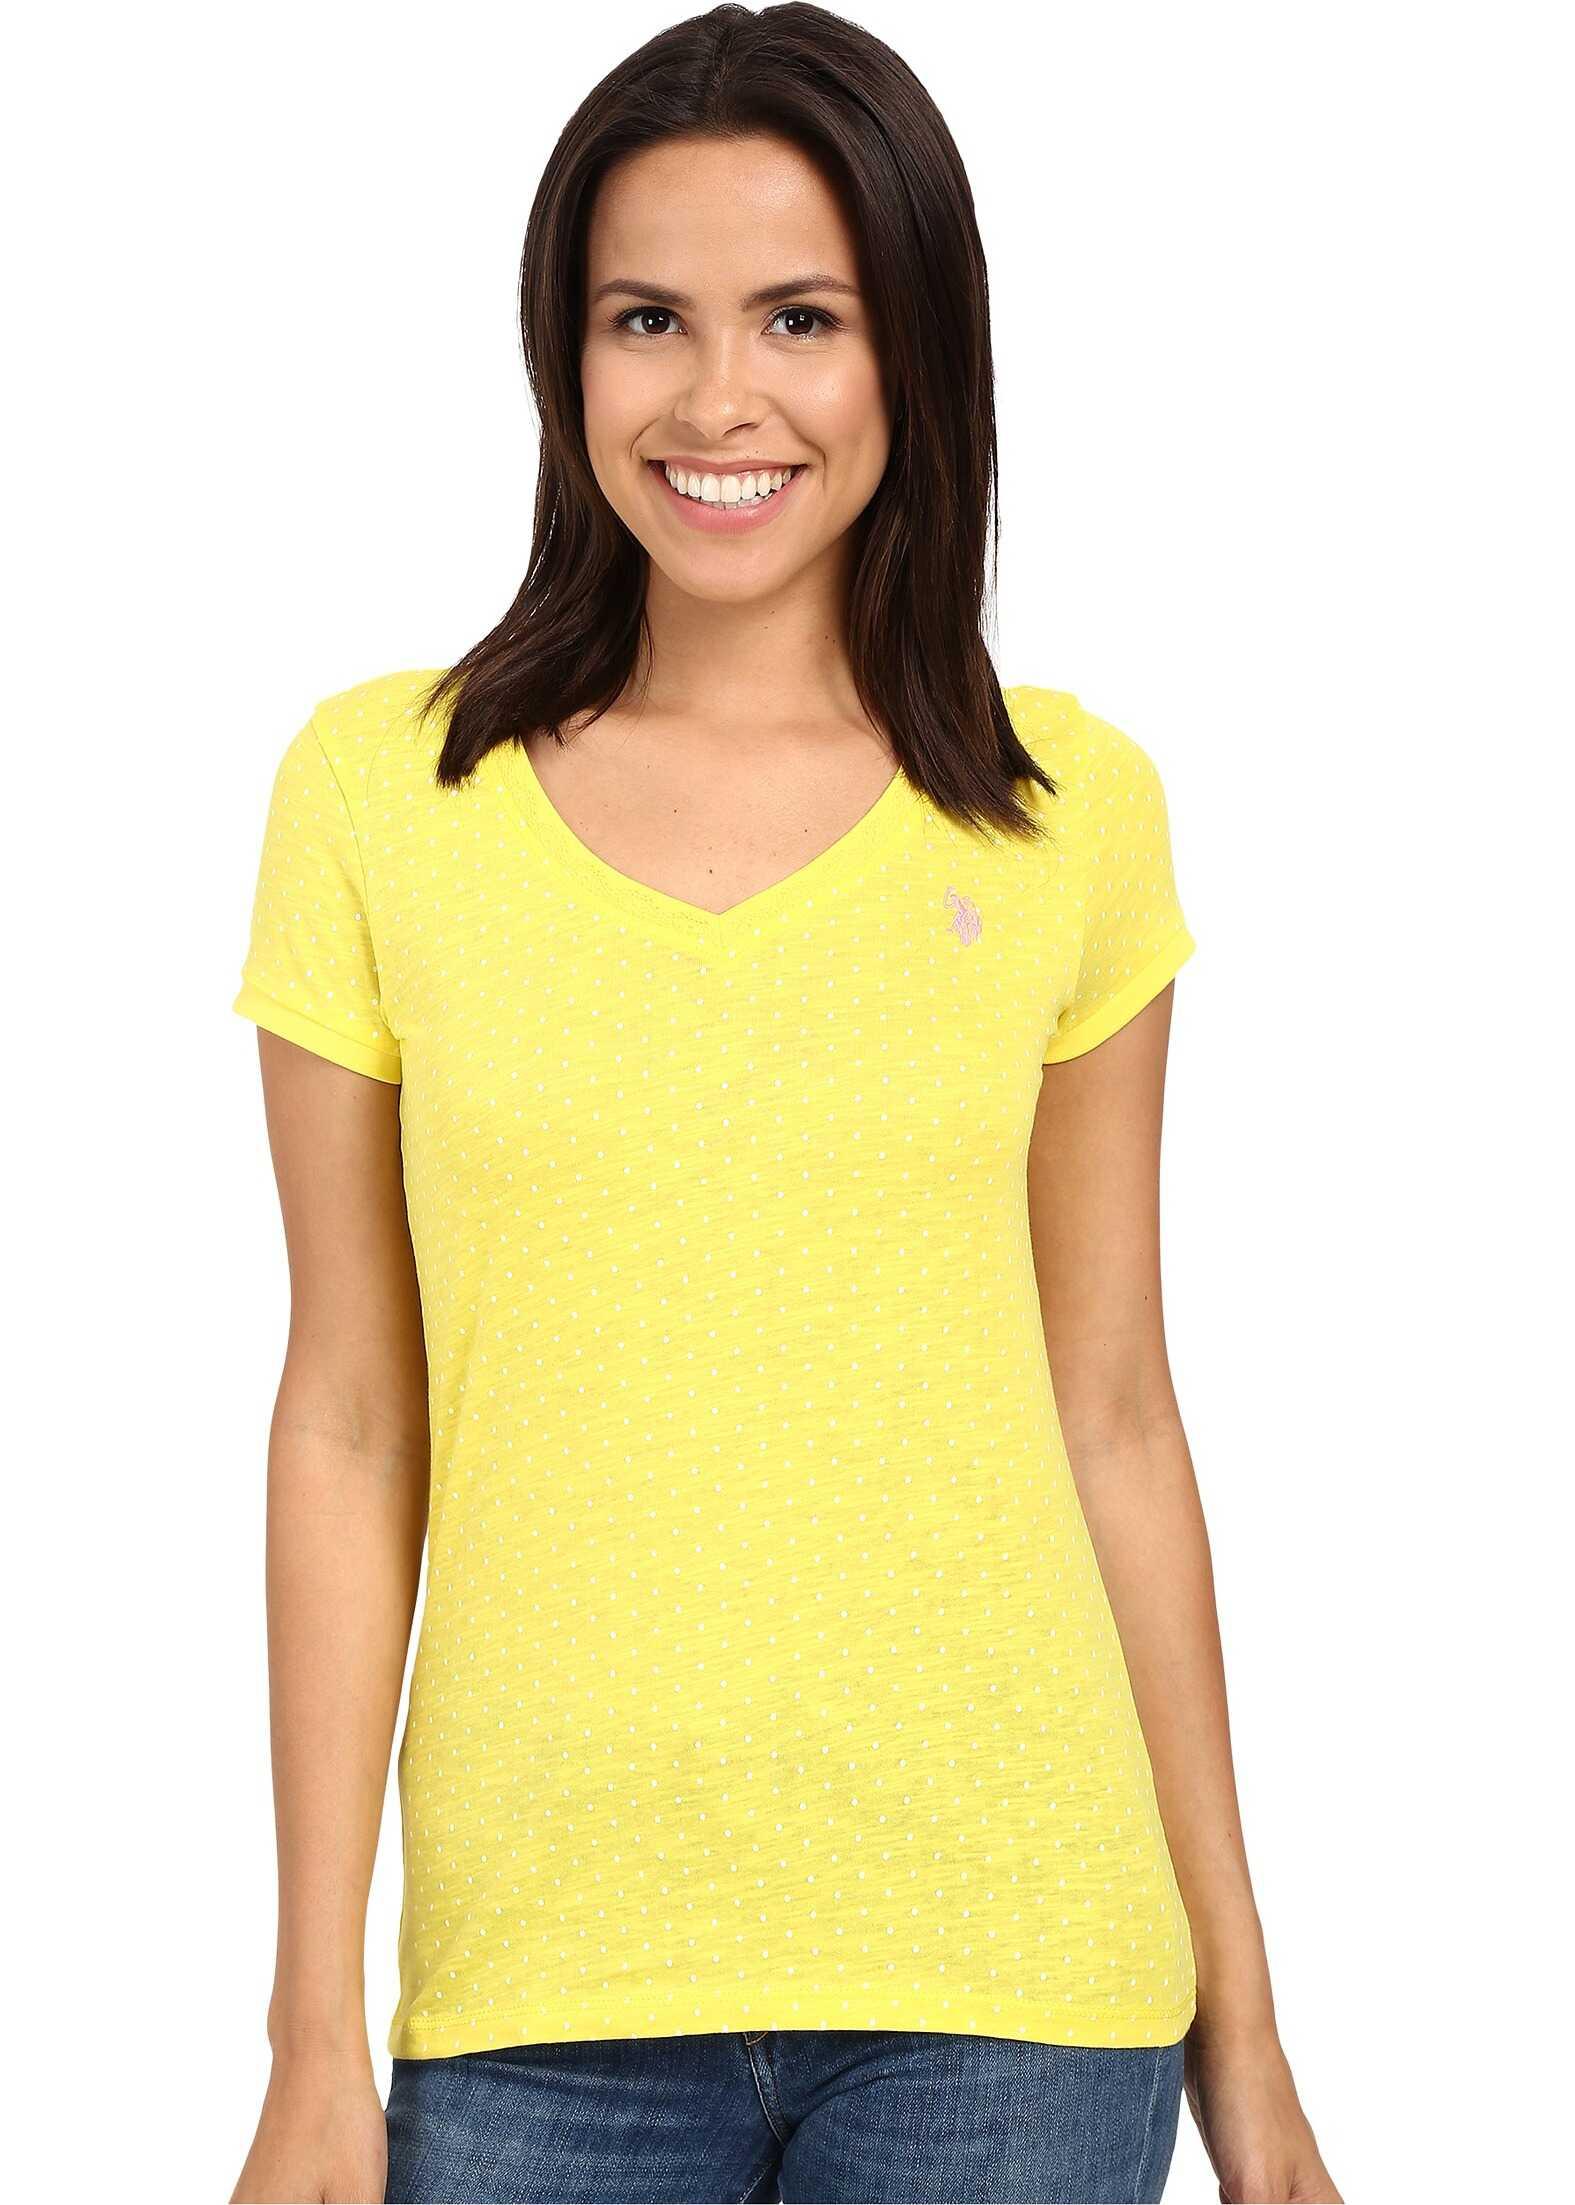 U.S. POLO ASSN. Polka Dot Lace Trim V-Neck T-Shirt Buttercup